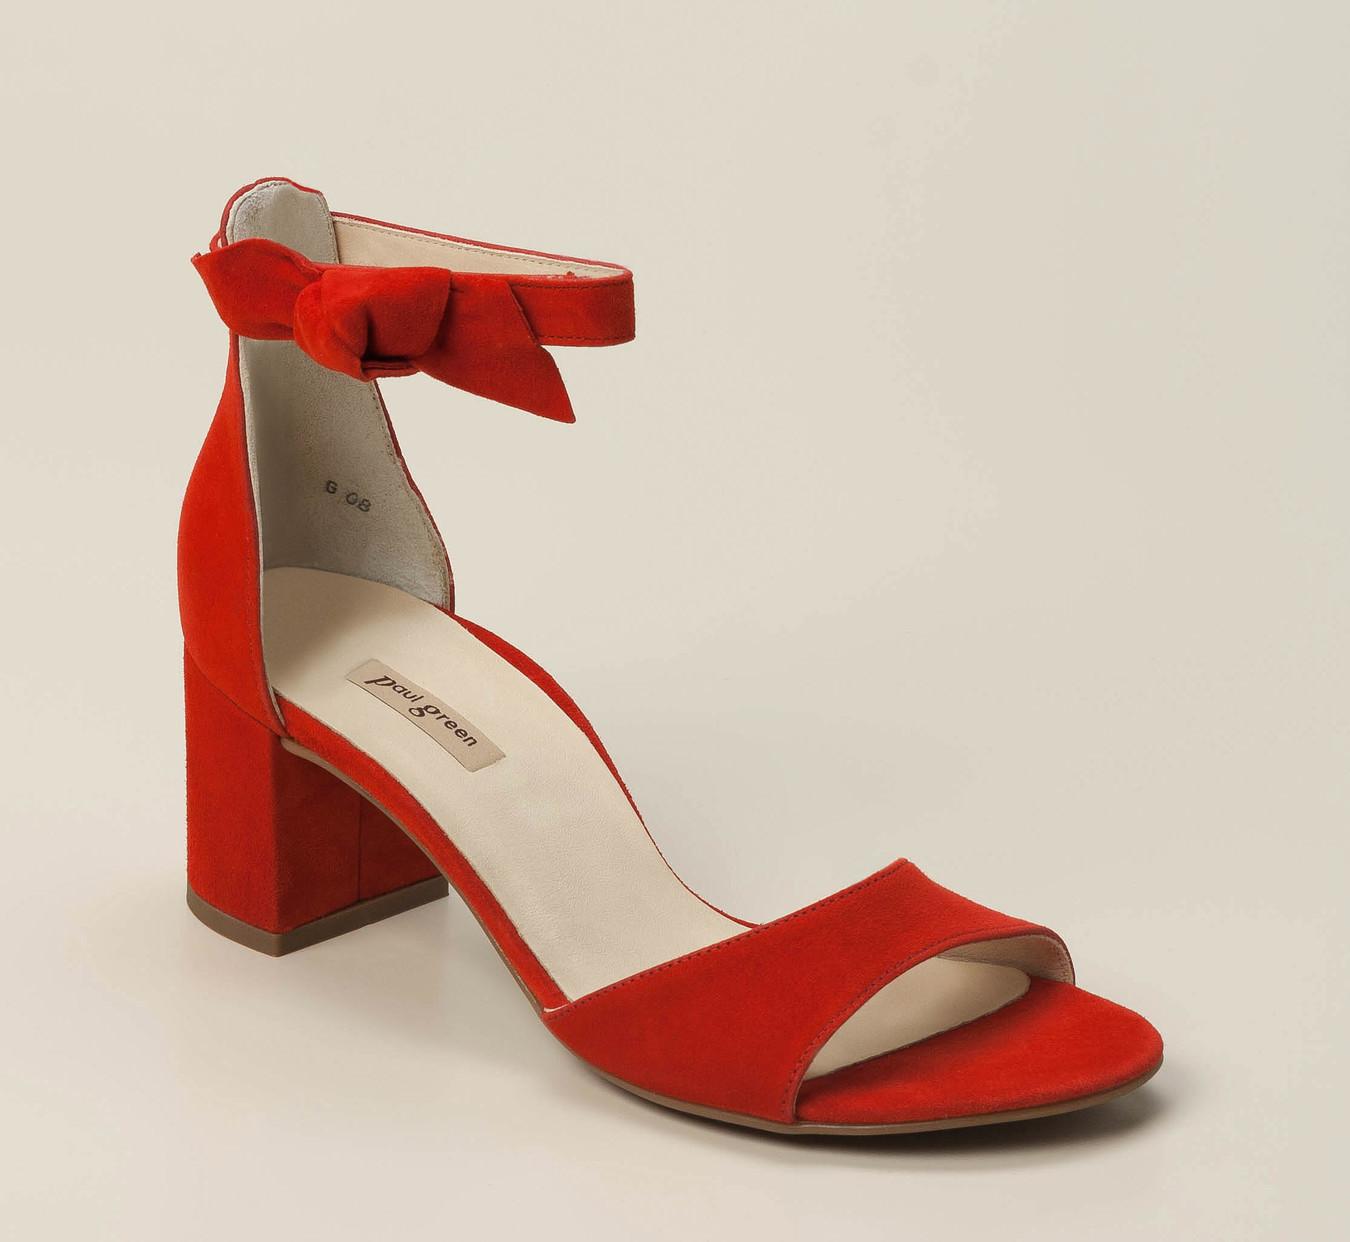 d434ac7b862ae1 Paul Green Damen Sandalette in rot kaufen